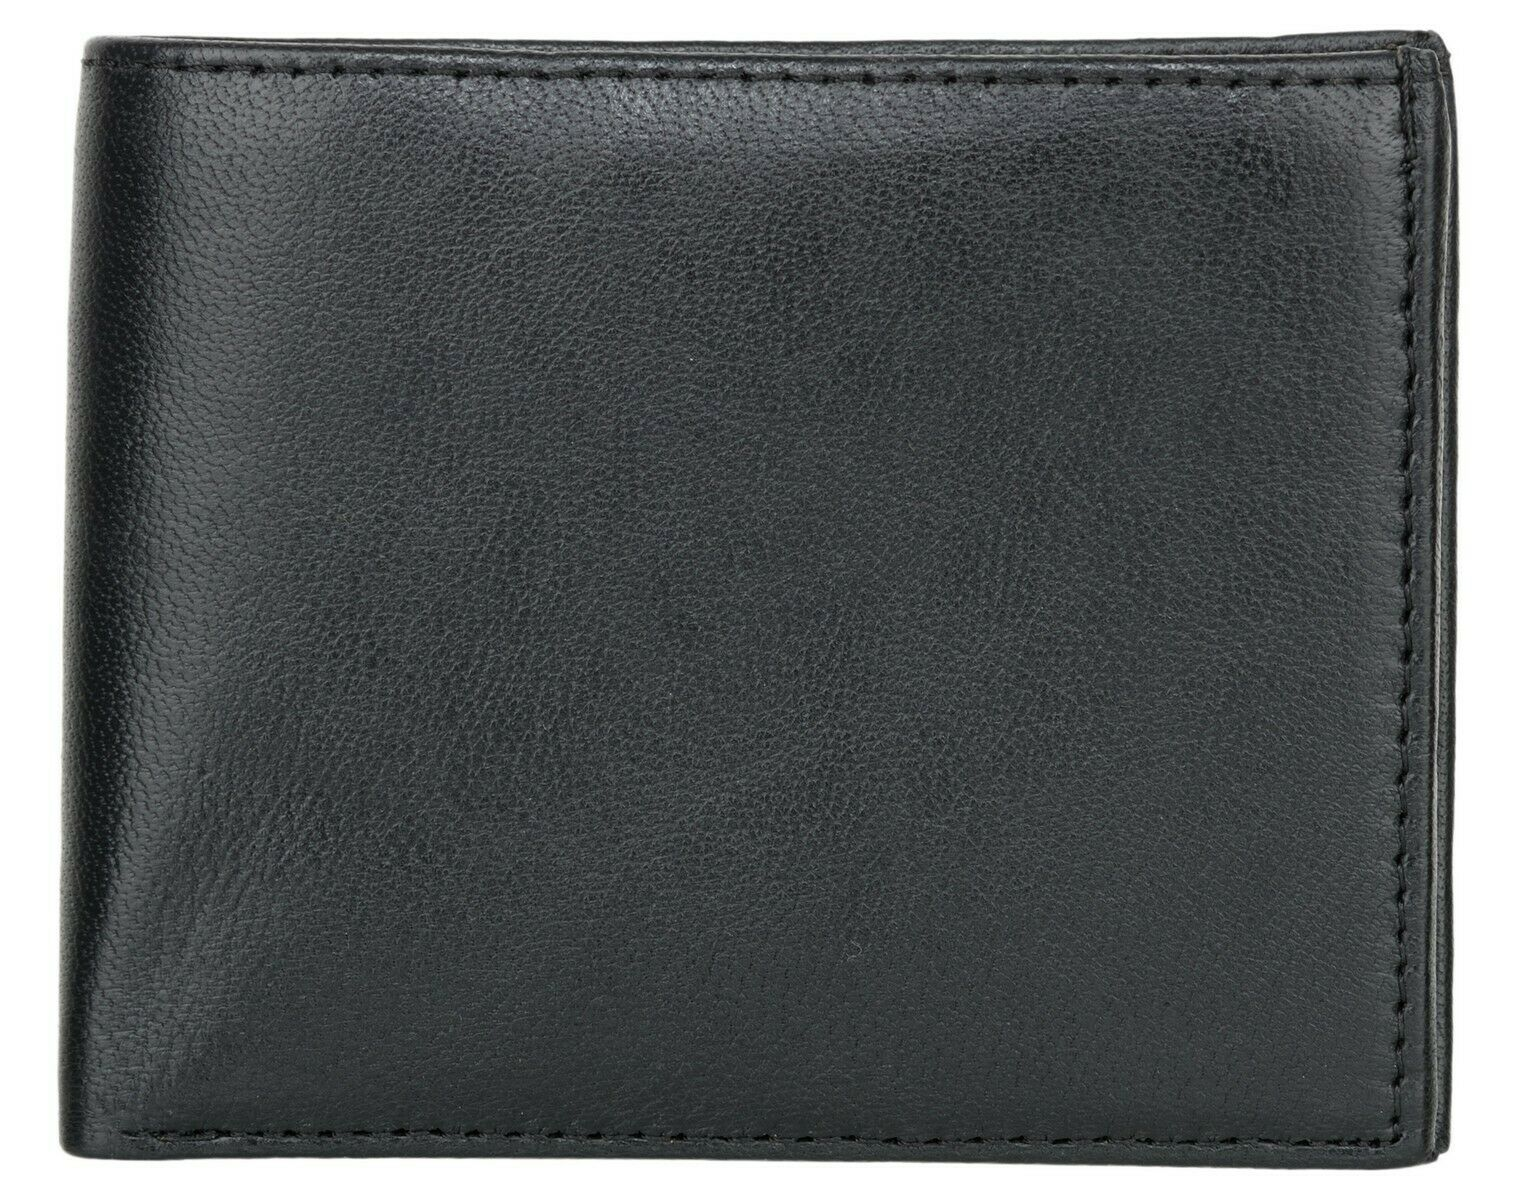 2 Pack - Men's Black RFID Blocking Genuine ID Window Leather Slim Bifold Wallet